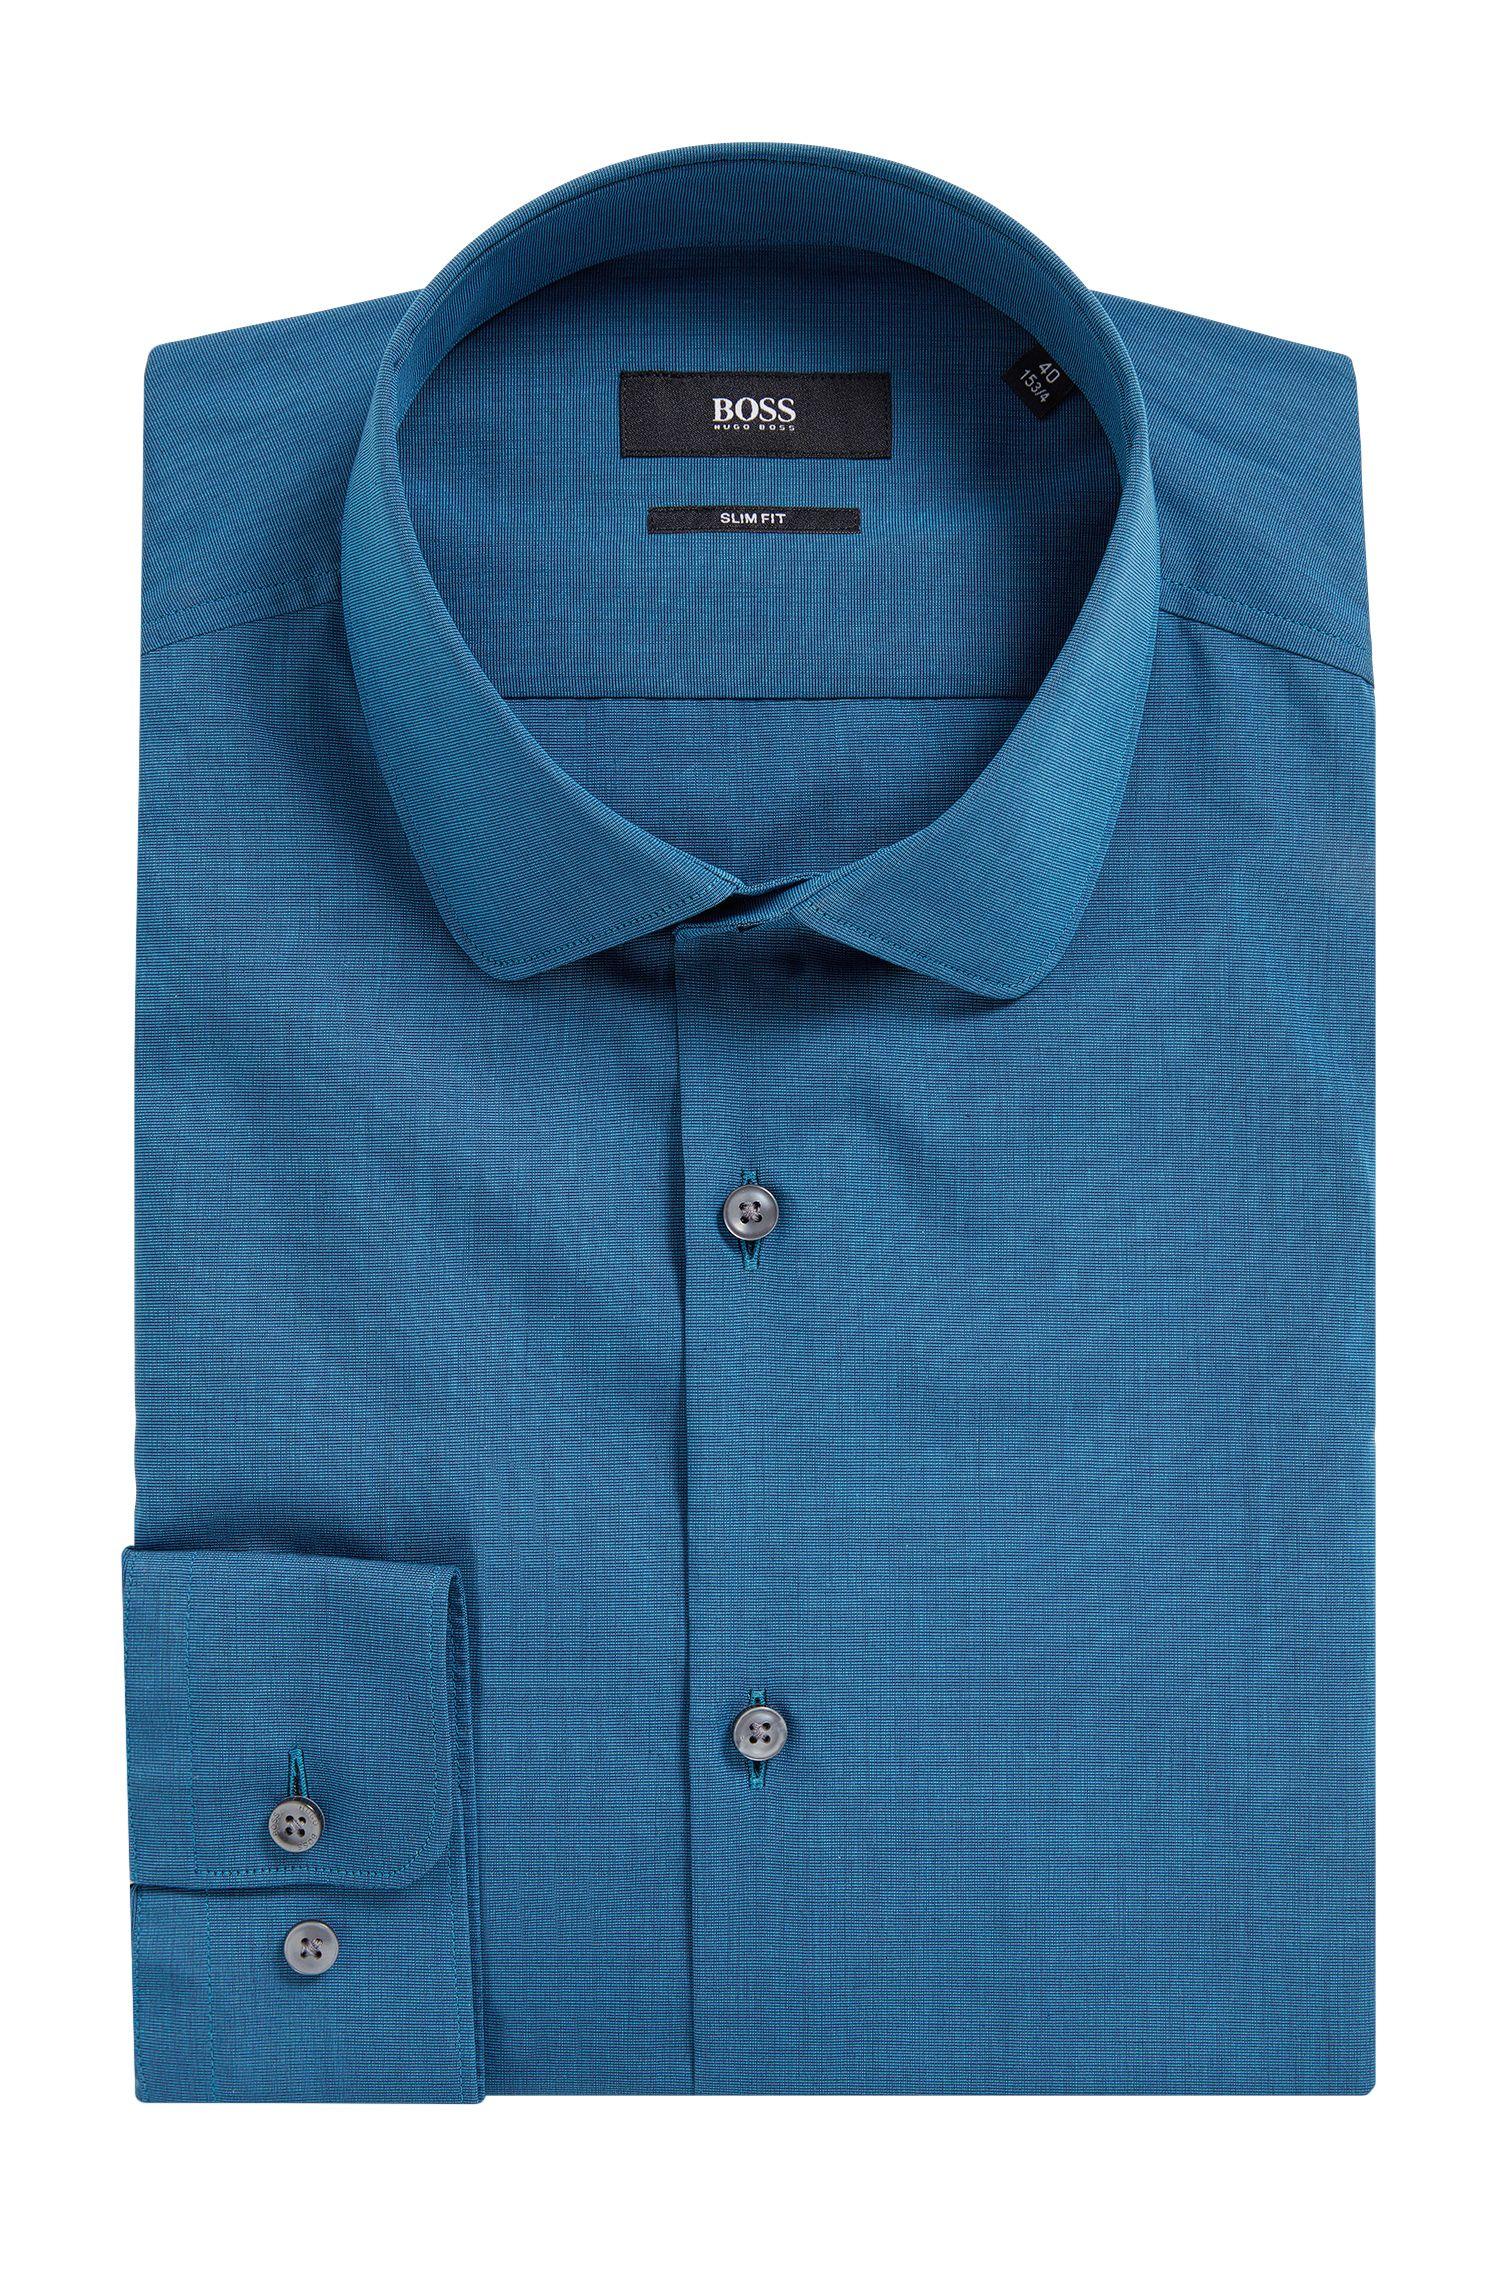 Cotton Poplin Dress Shirt, Slim Fit   Joshua